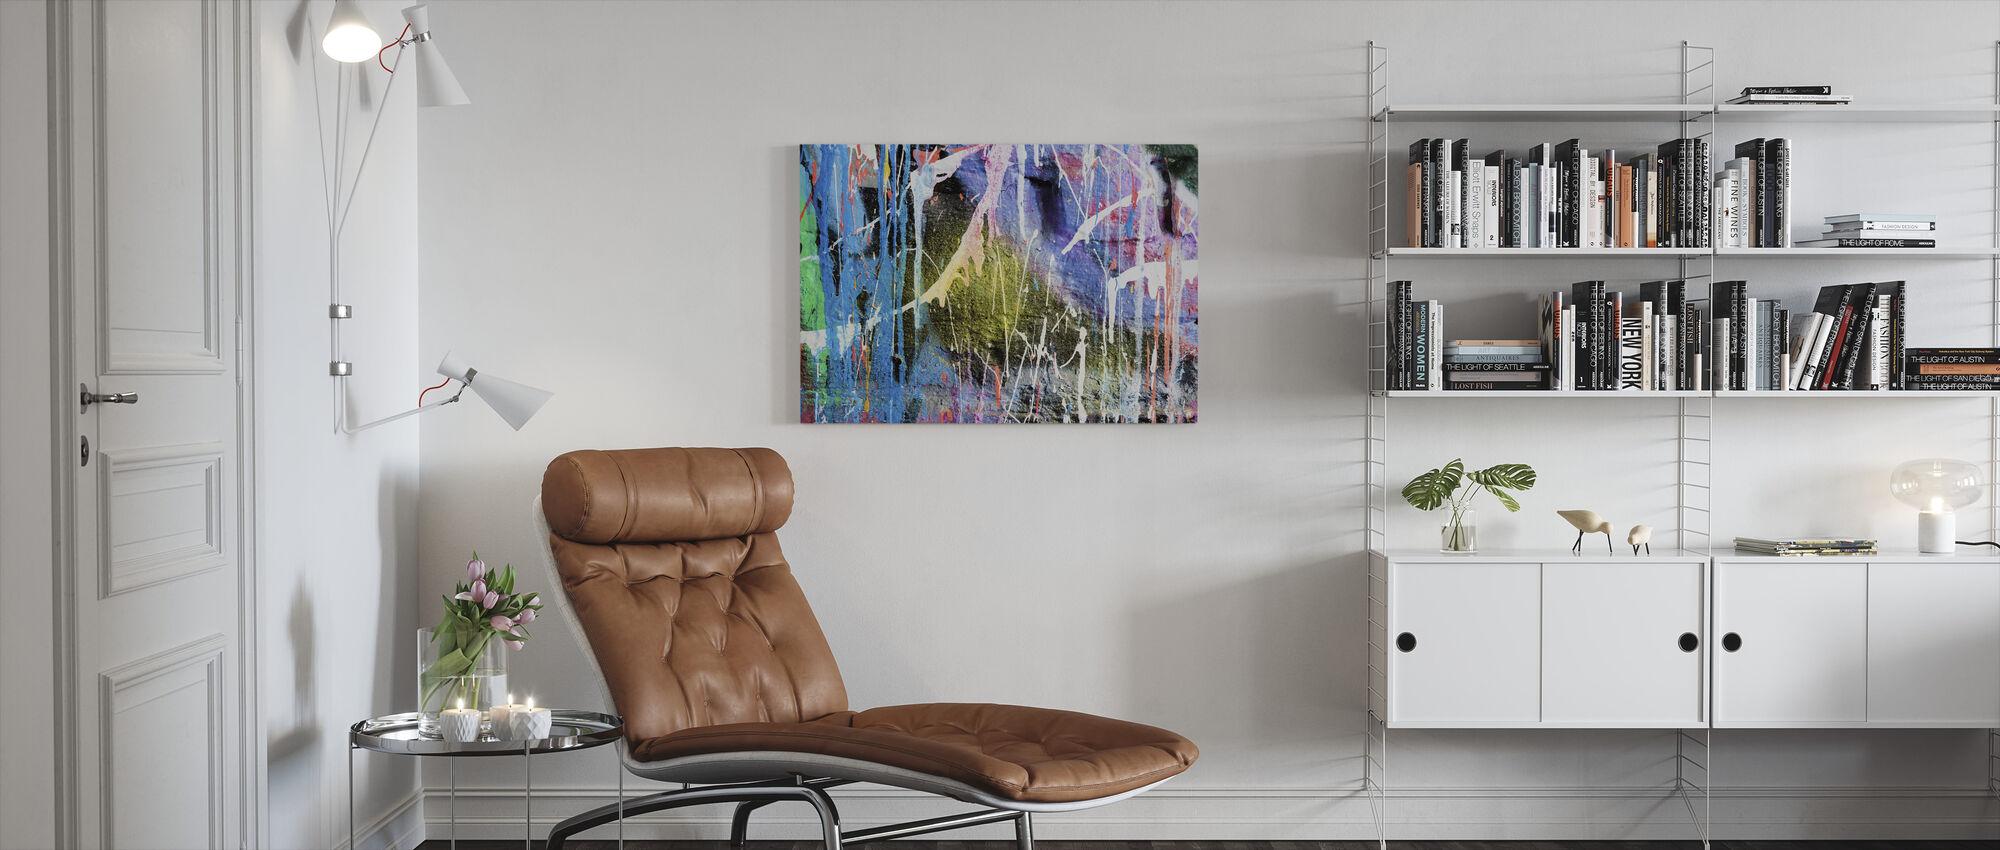 Dripping Paint Graffiti Wall - Canvas print - Living Room